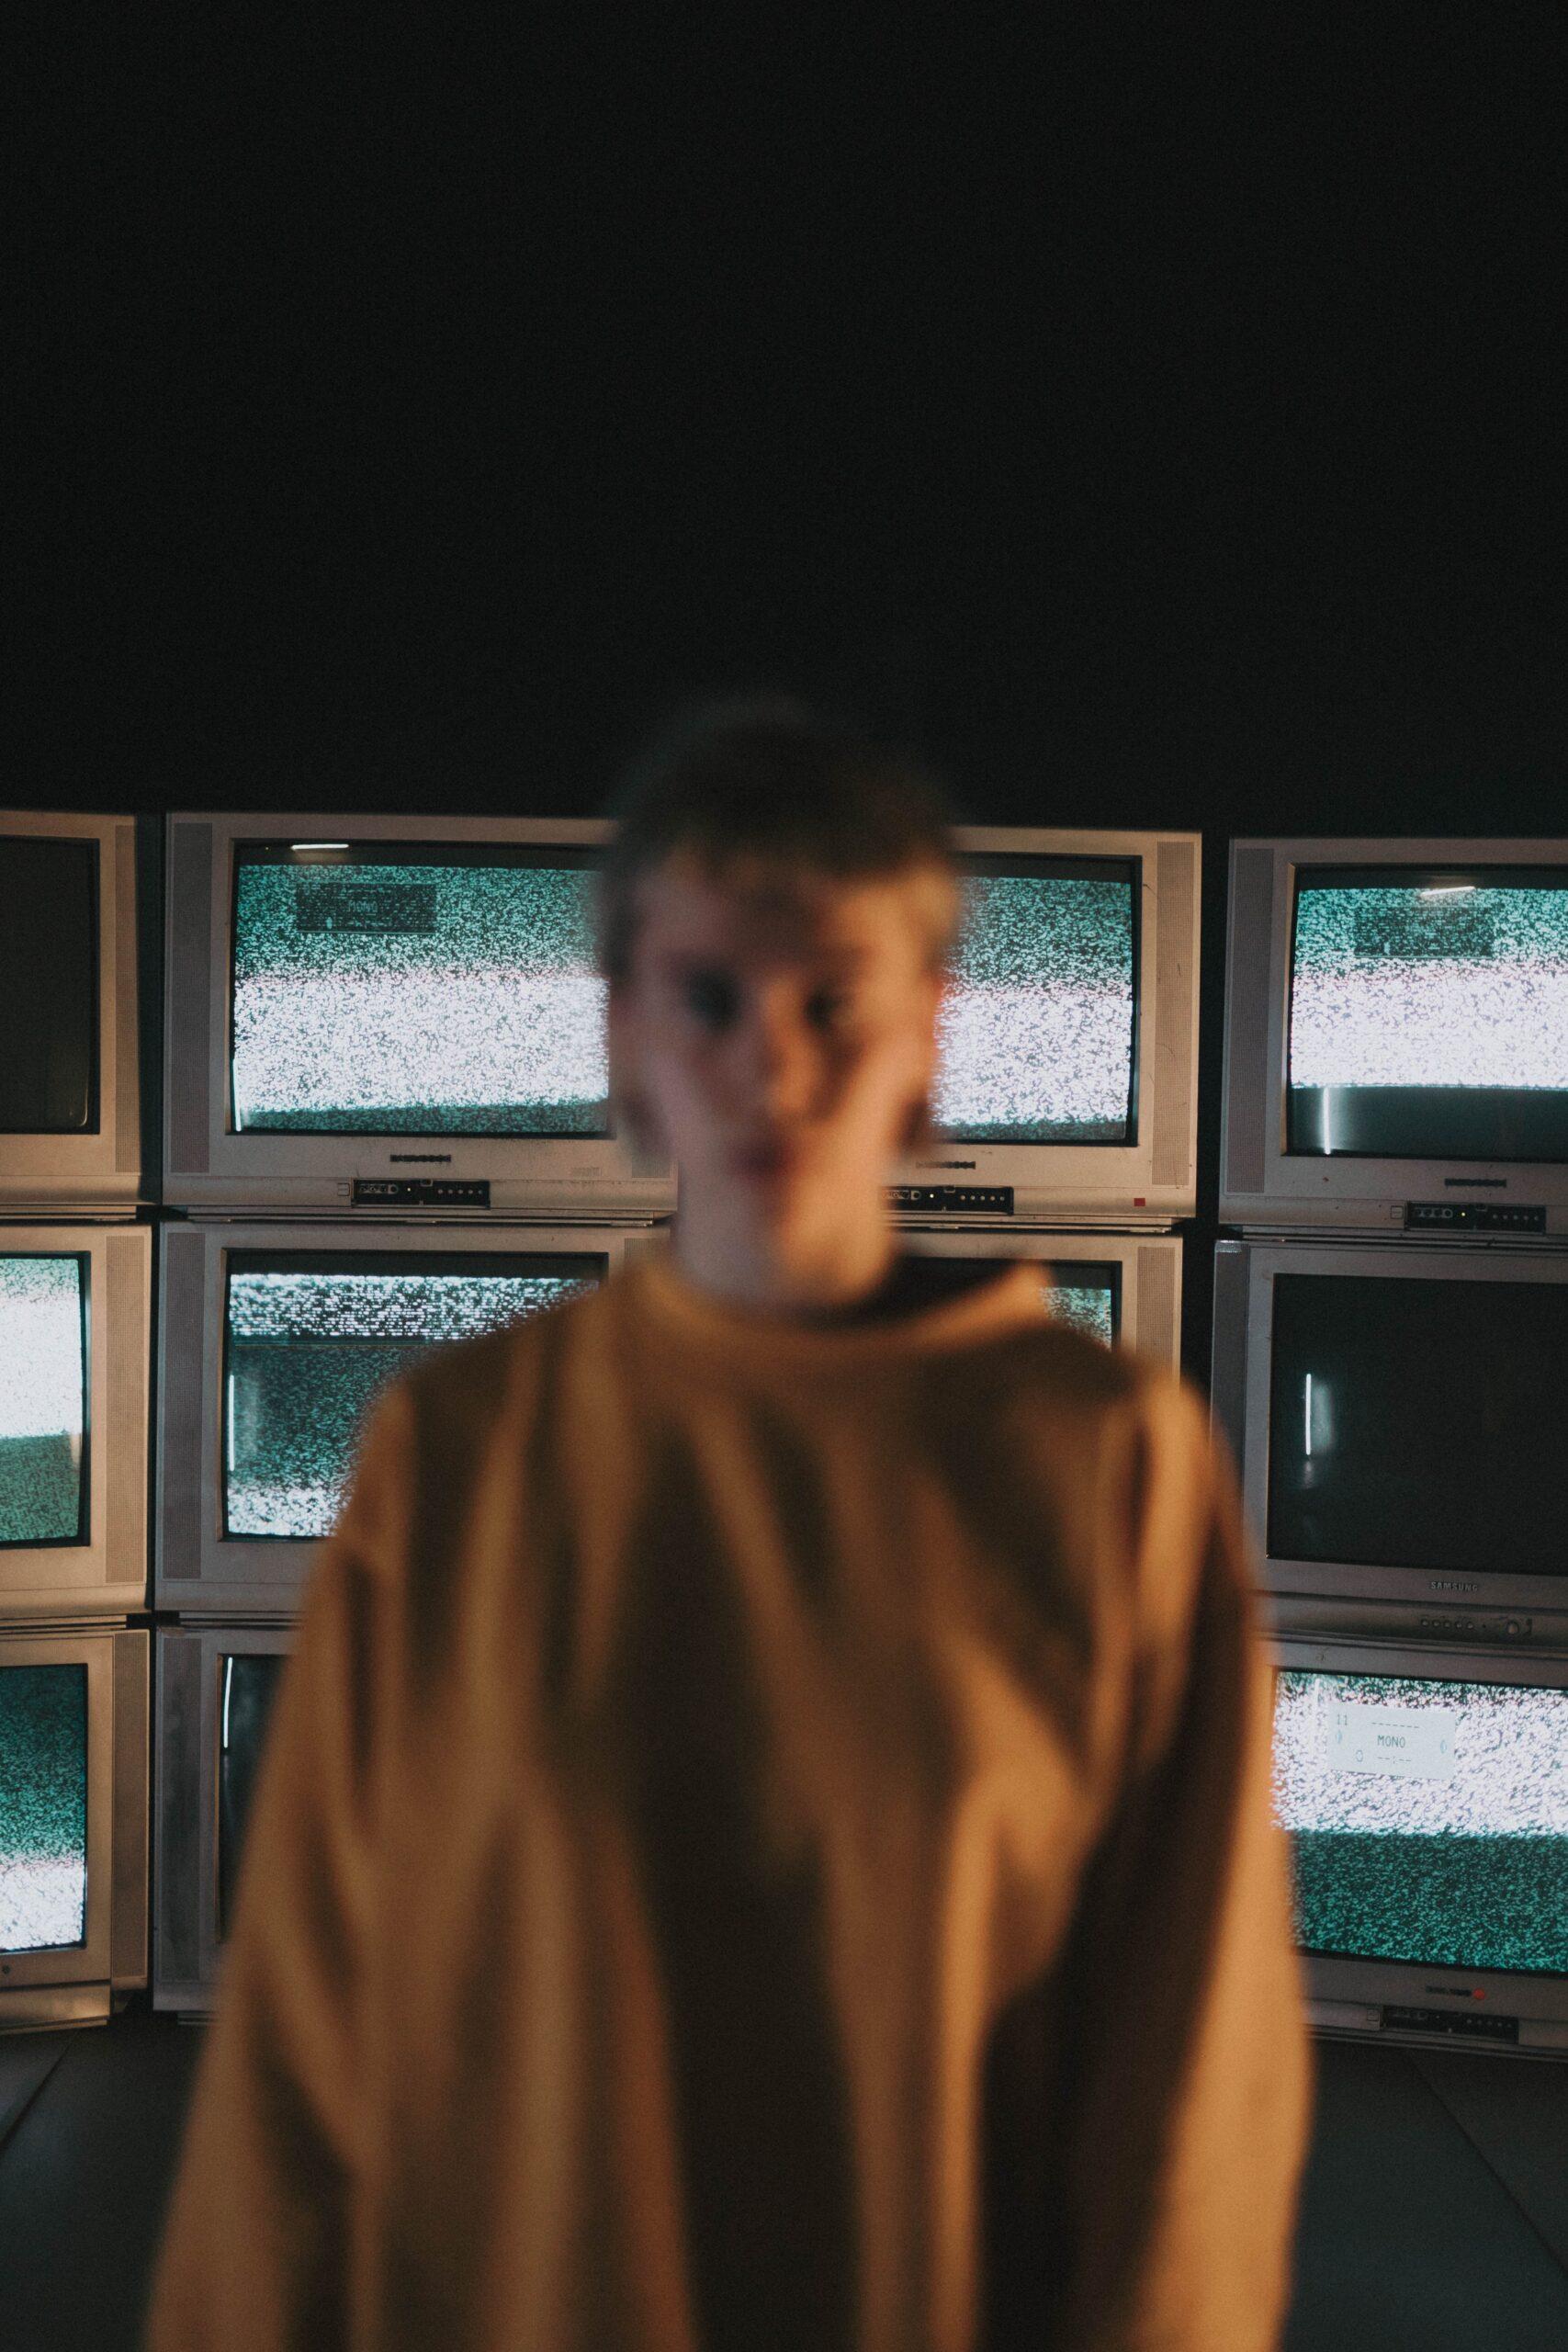 man in brown sweater standing near window